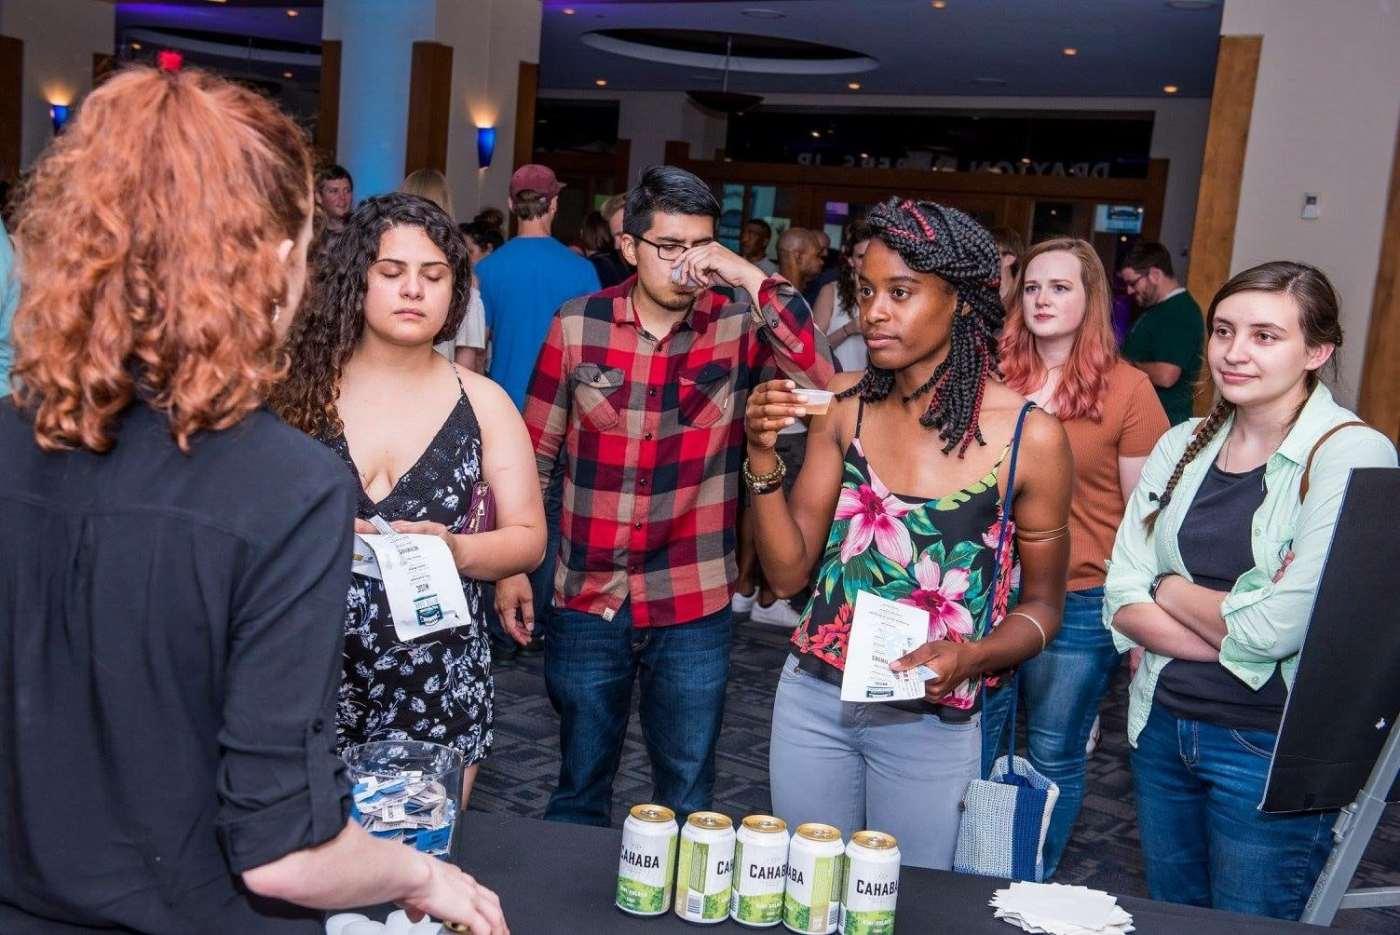 Birmingham, McWane Science Center, McWane After Dark, New Beer's Eve